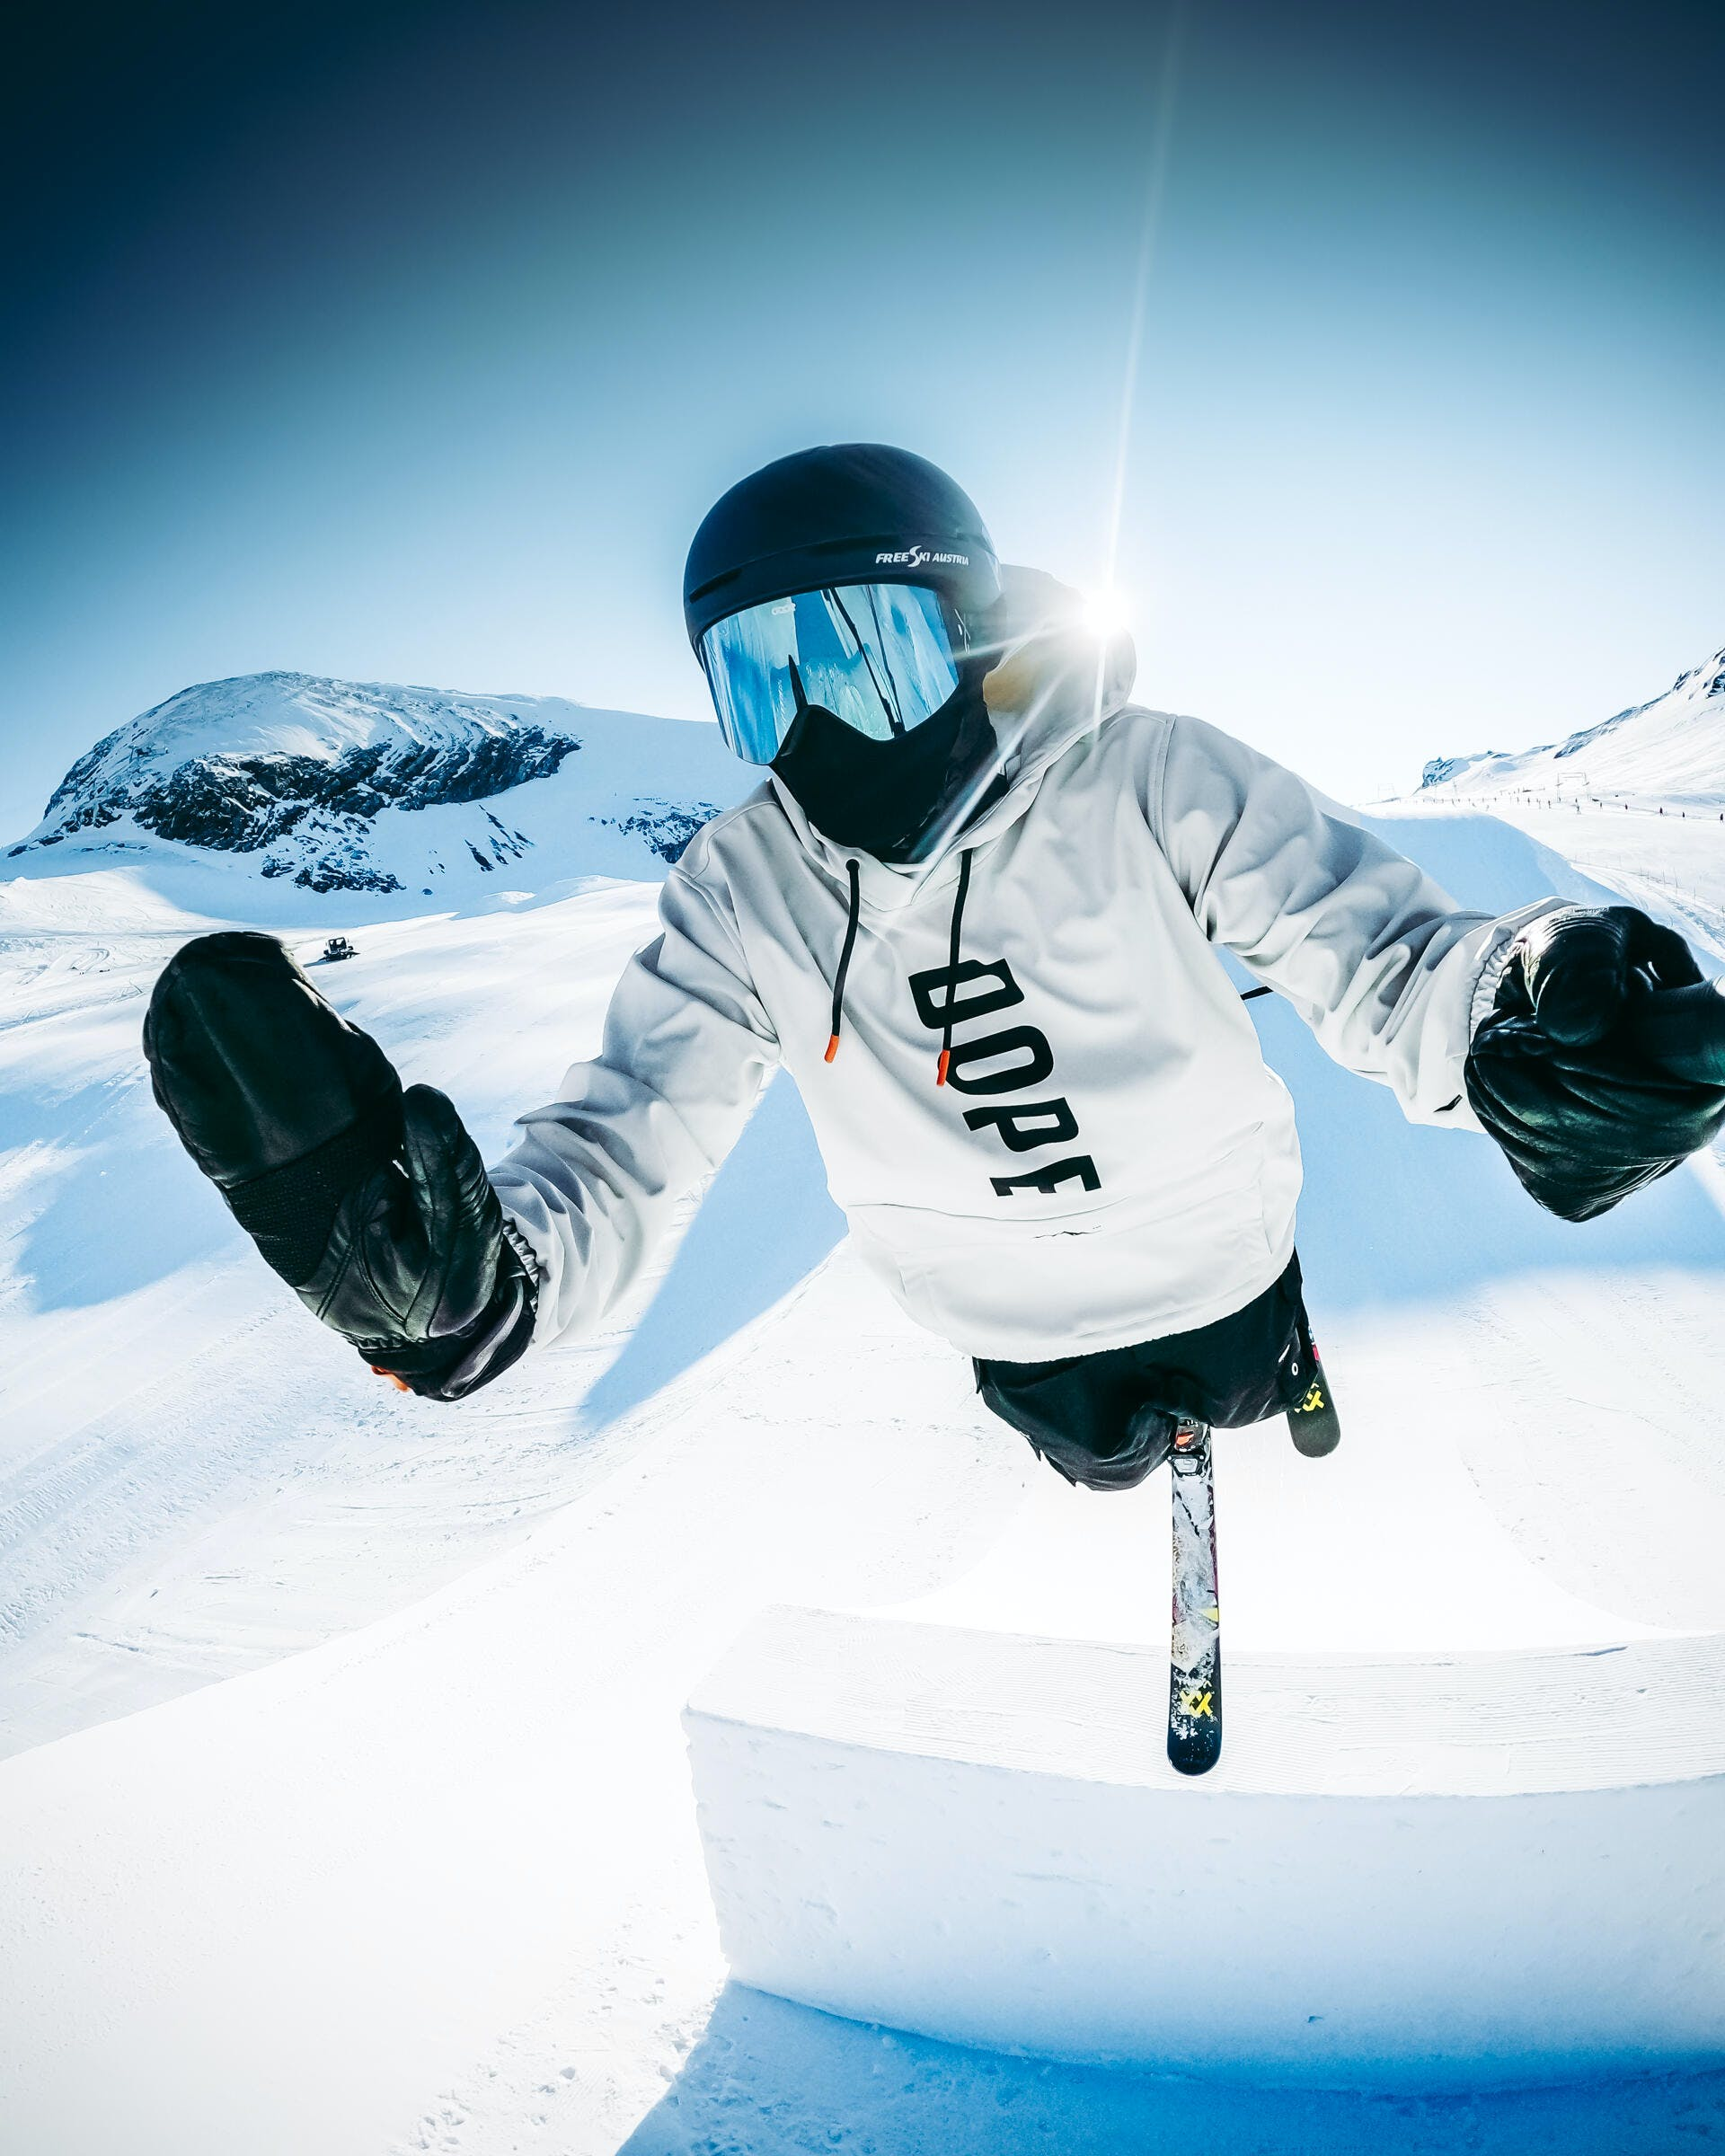 skiing frontflip